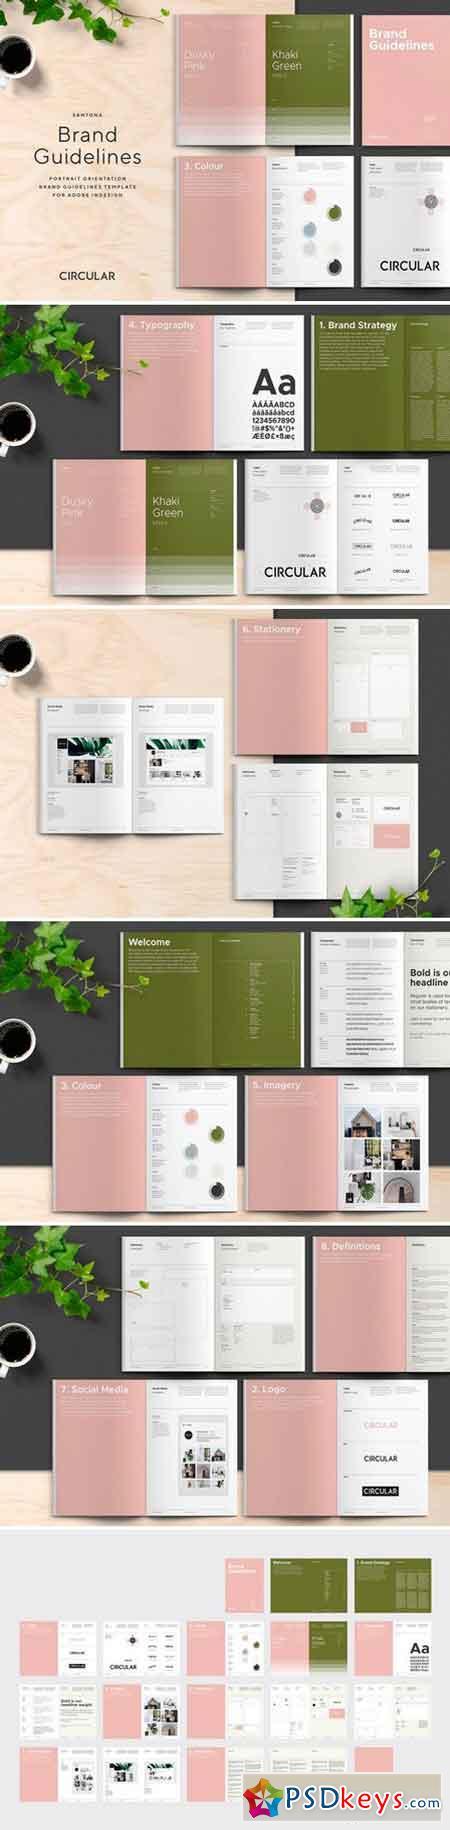 SANTONA Brand Guidelines 2450153